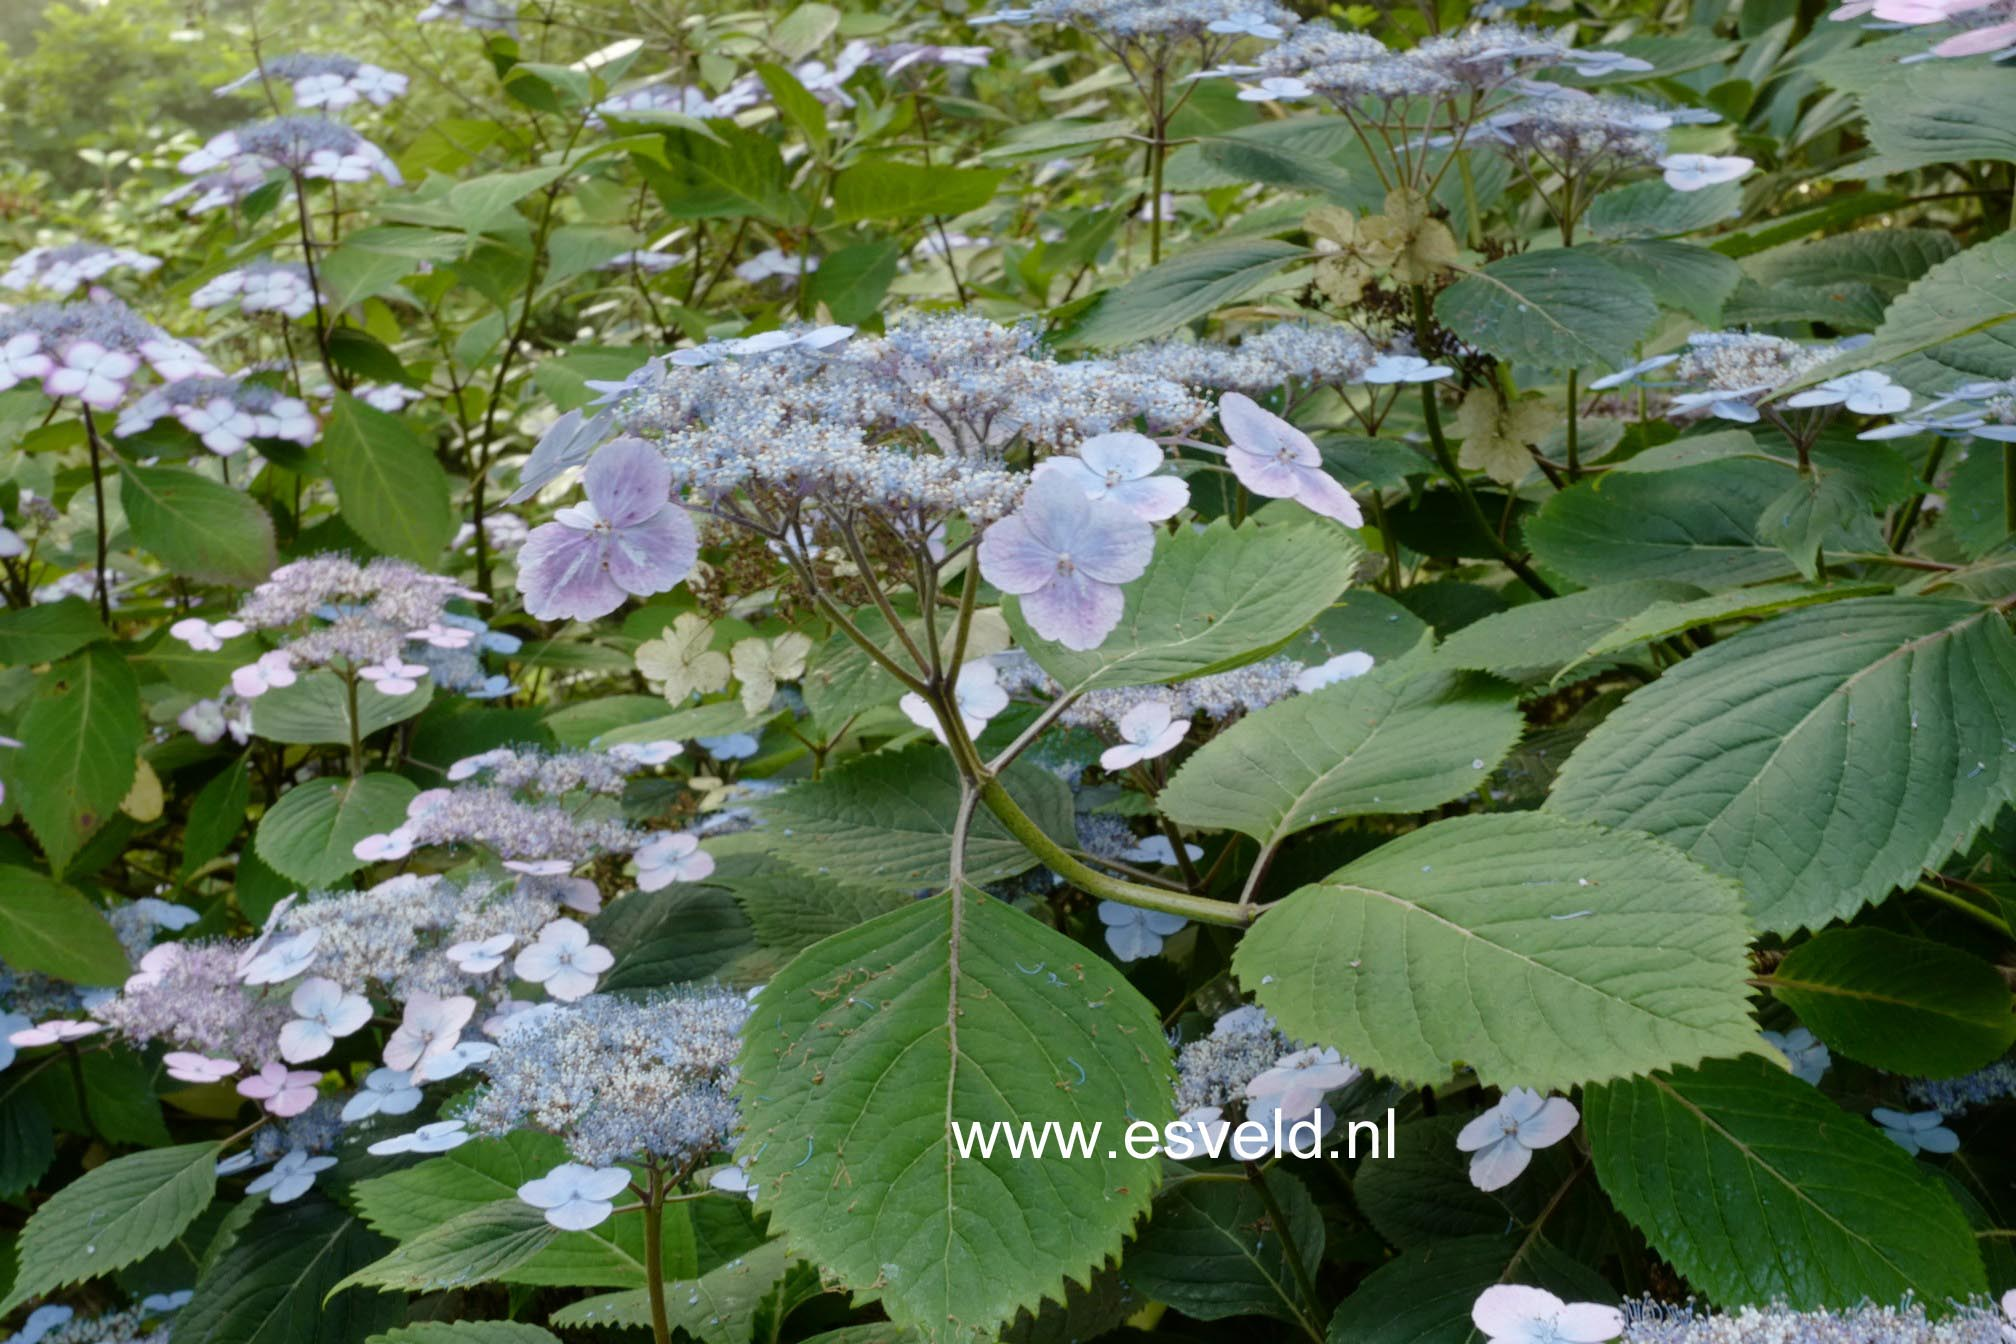 Hydrangea serrata 'Veerle'